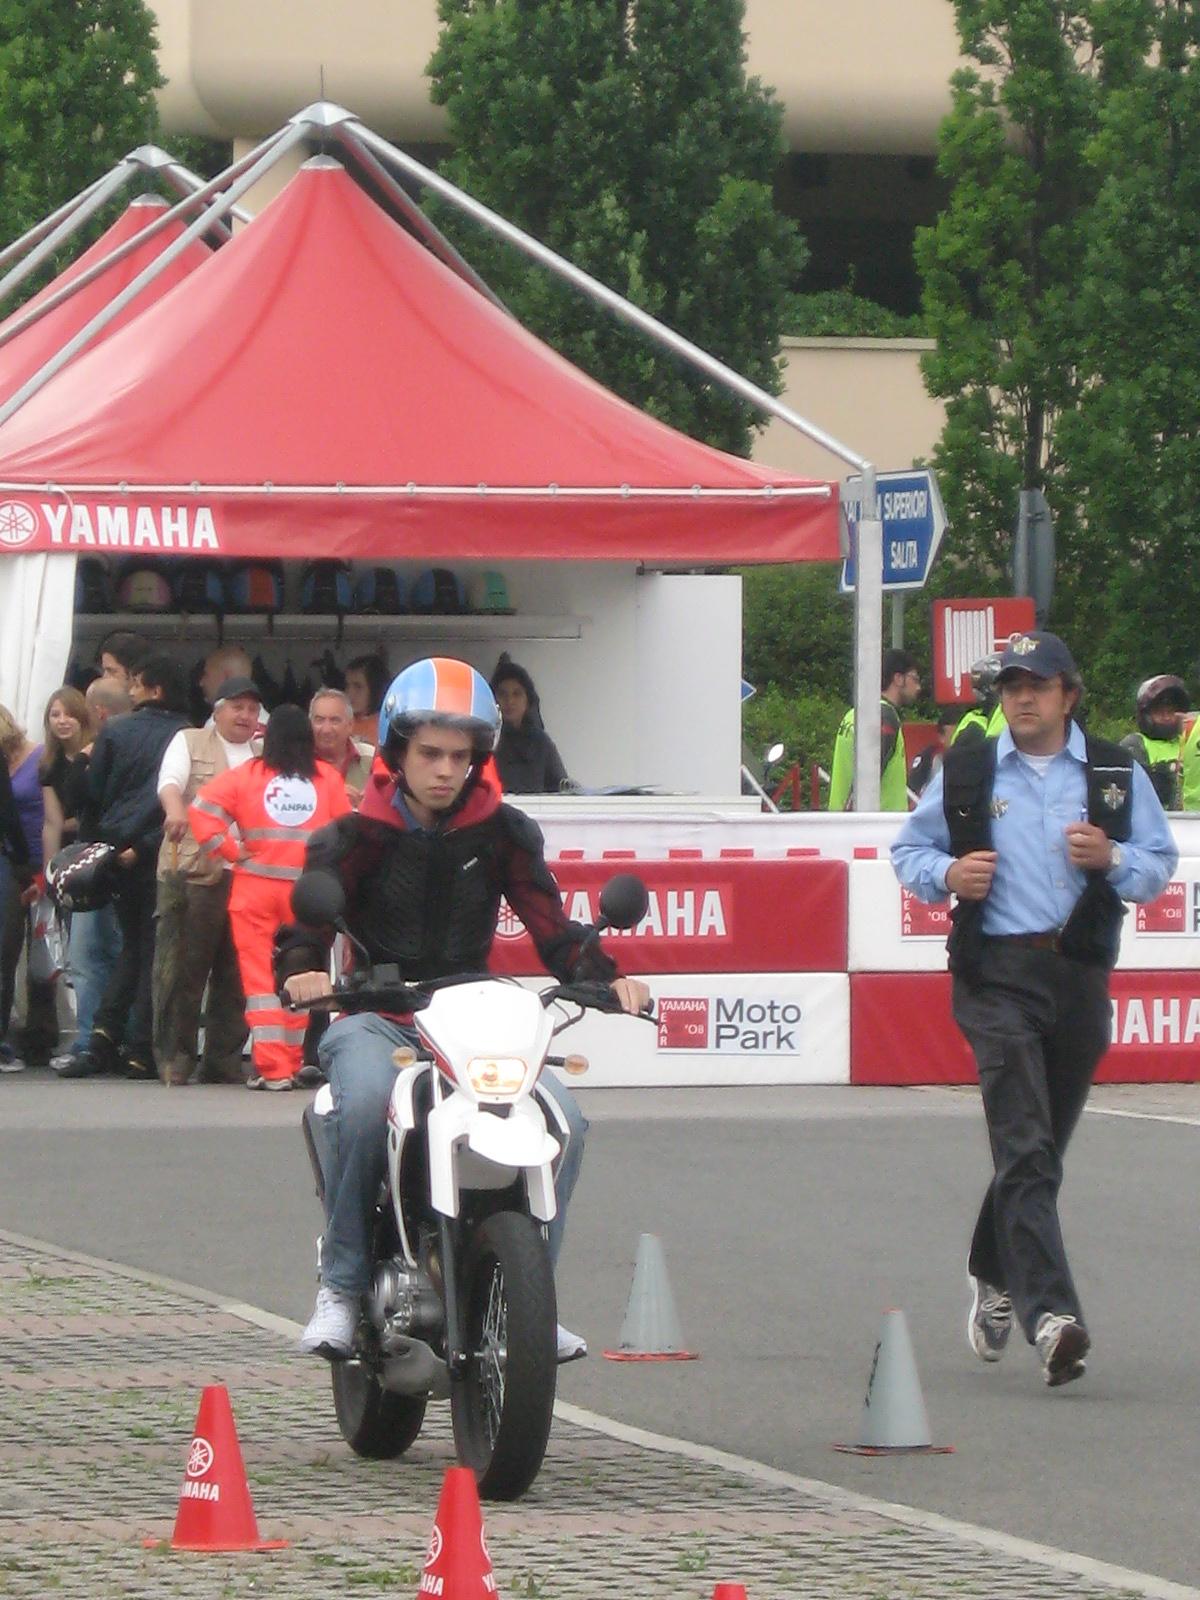 yamaha moto park events